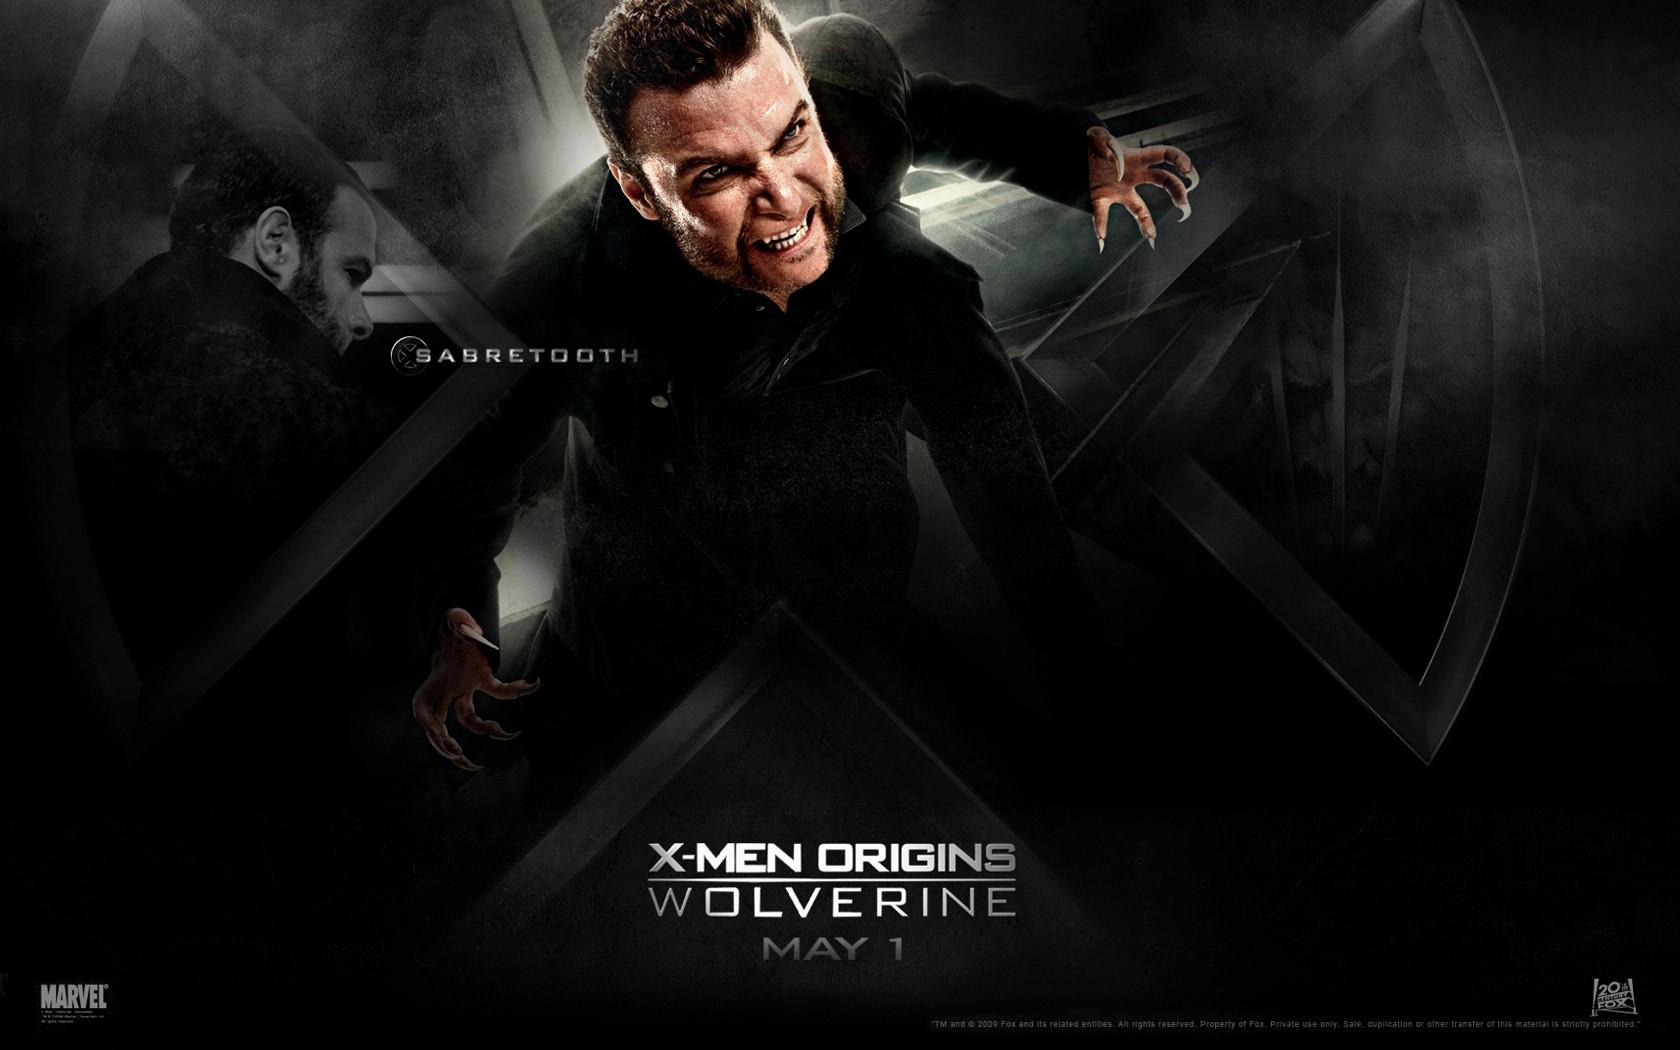 X MEN (映画シリーズ)の画像 p1_36